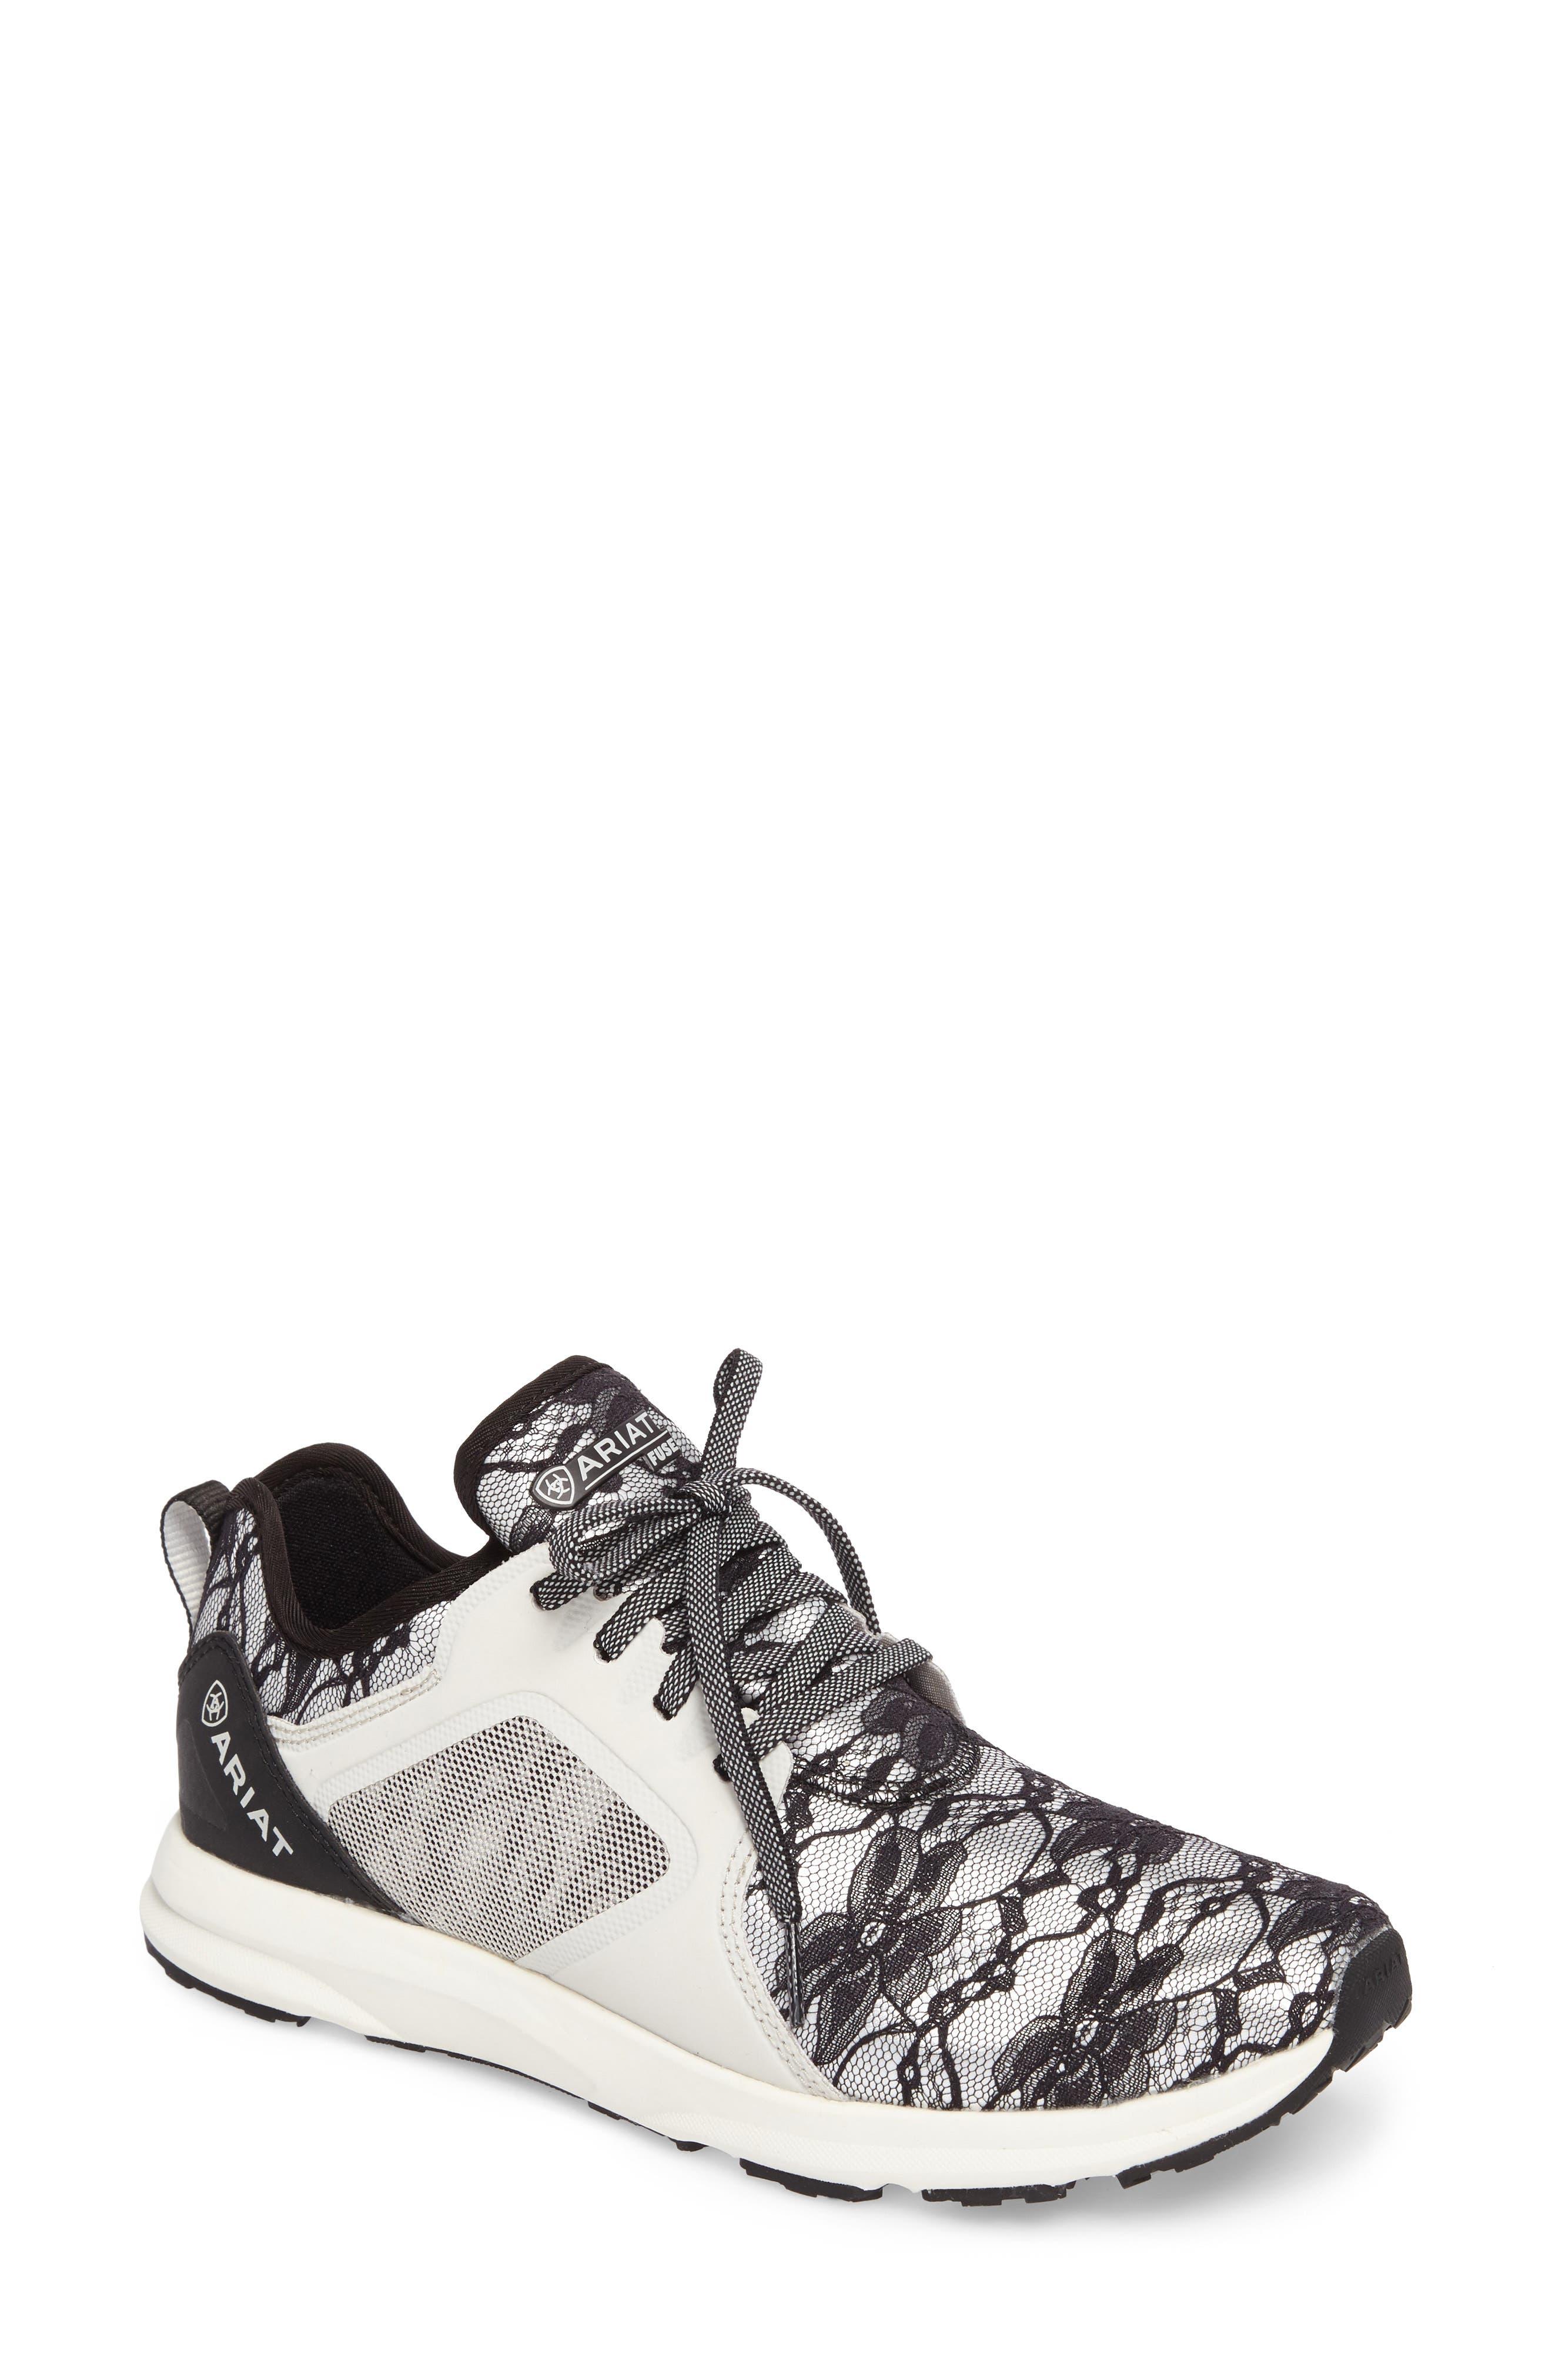 Fuse Print Sneaker,                             Main thumbnail 1, color,                             001